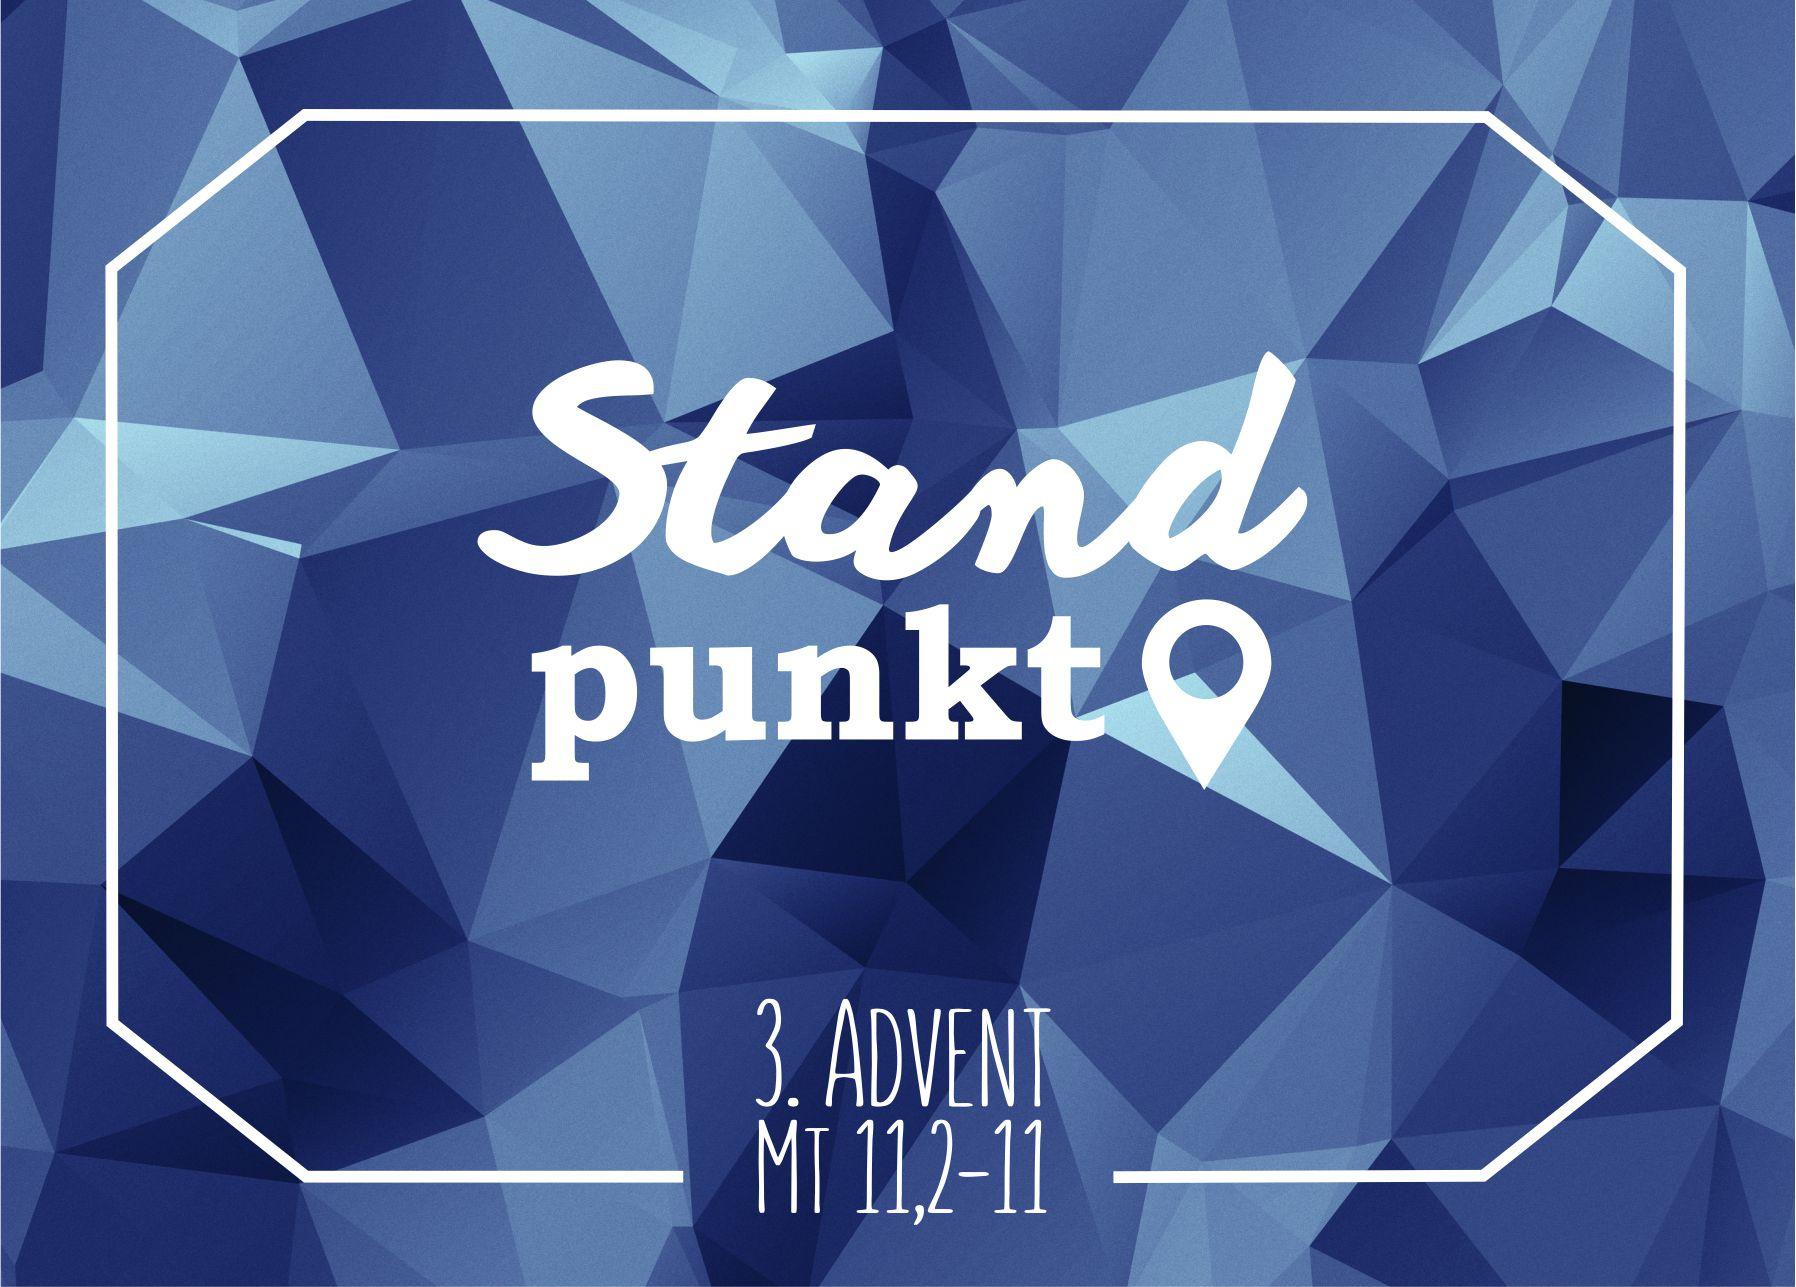 3. Advent - Standpunkt